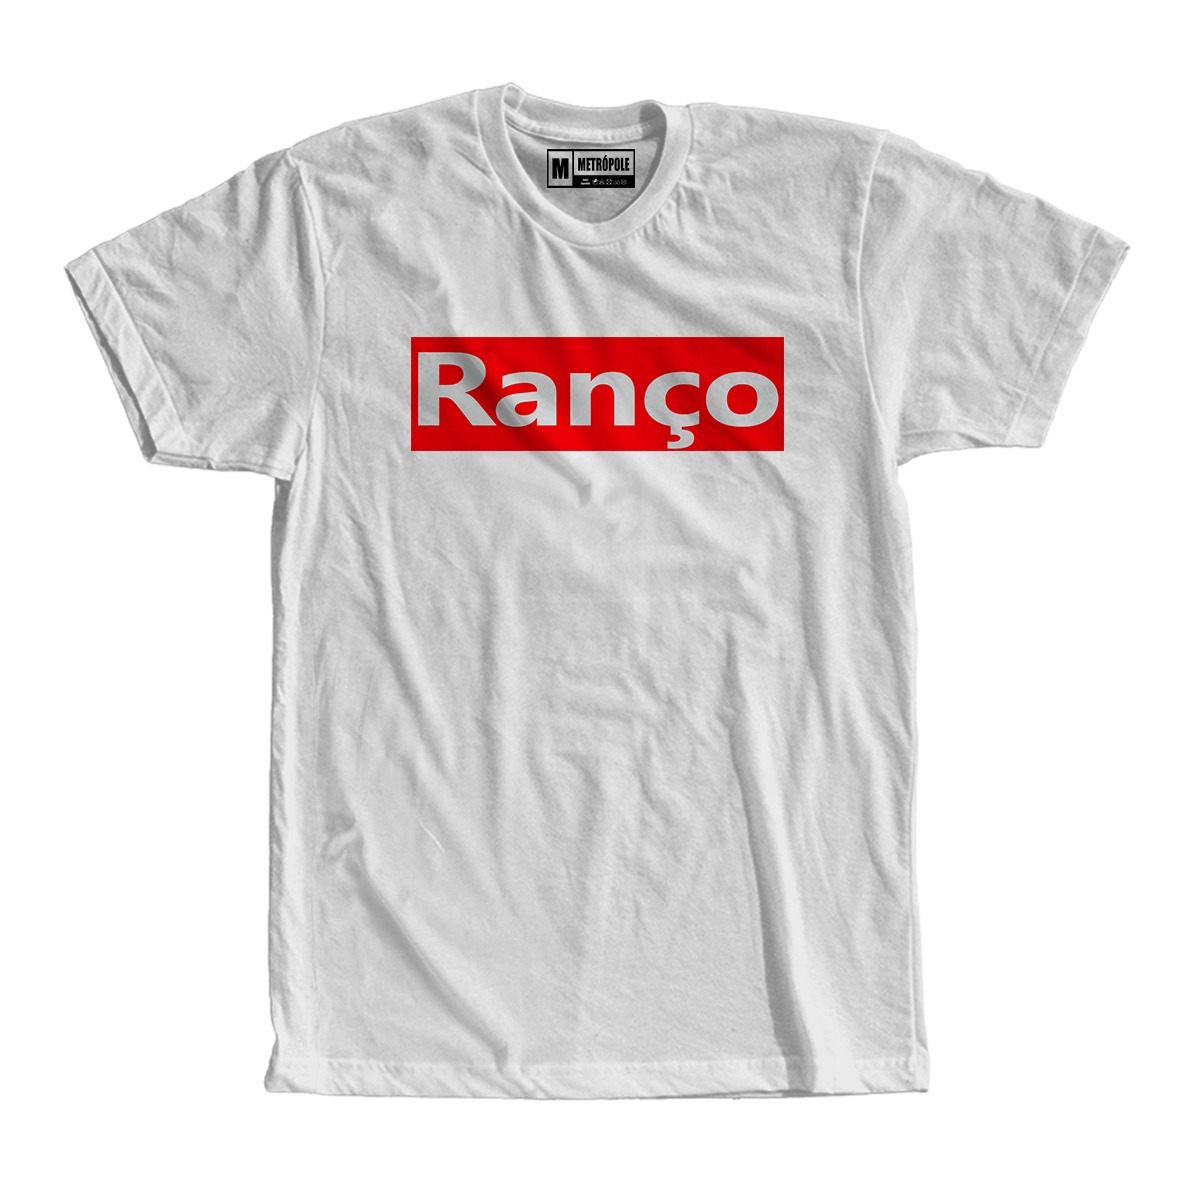 Camiseta Camisa Ranço Tumblr Frases Plena Moda Instagram R 3590